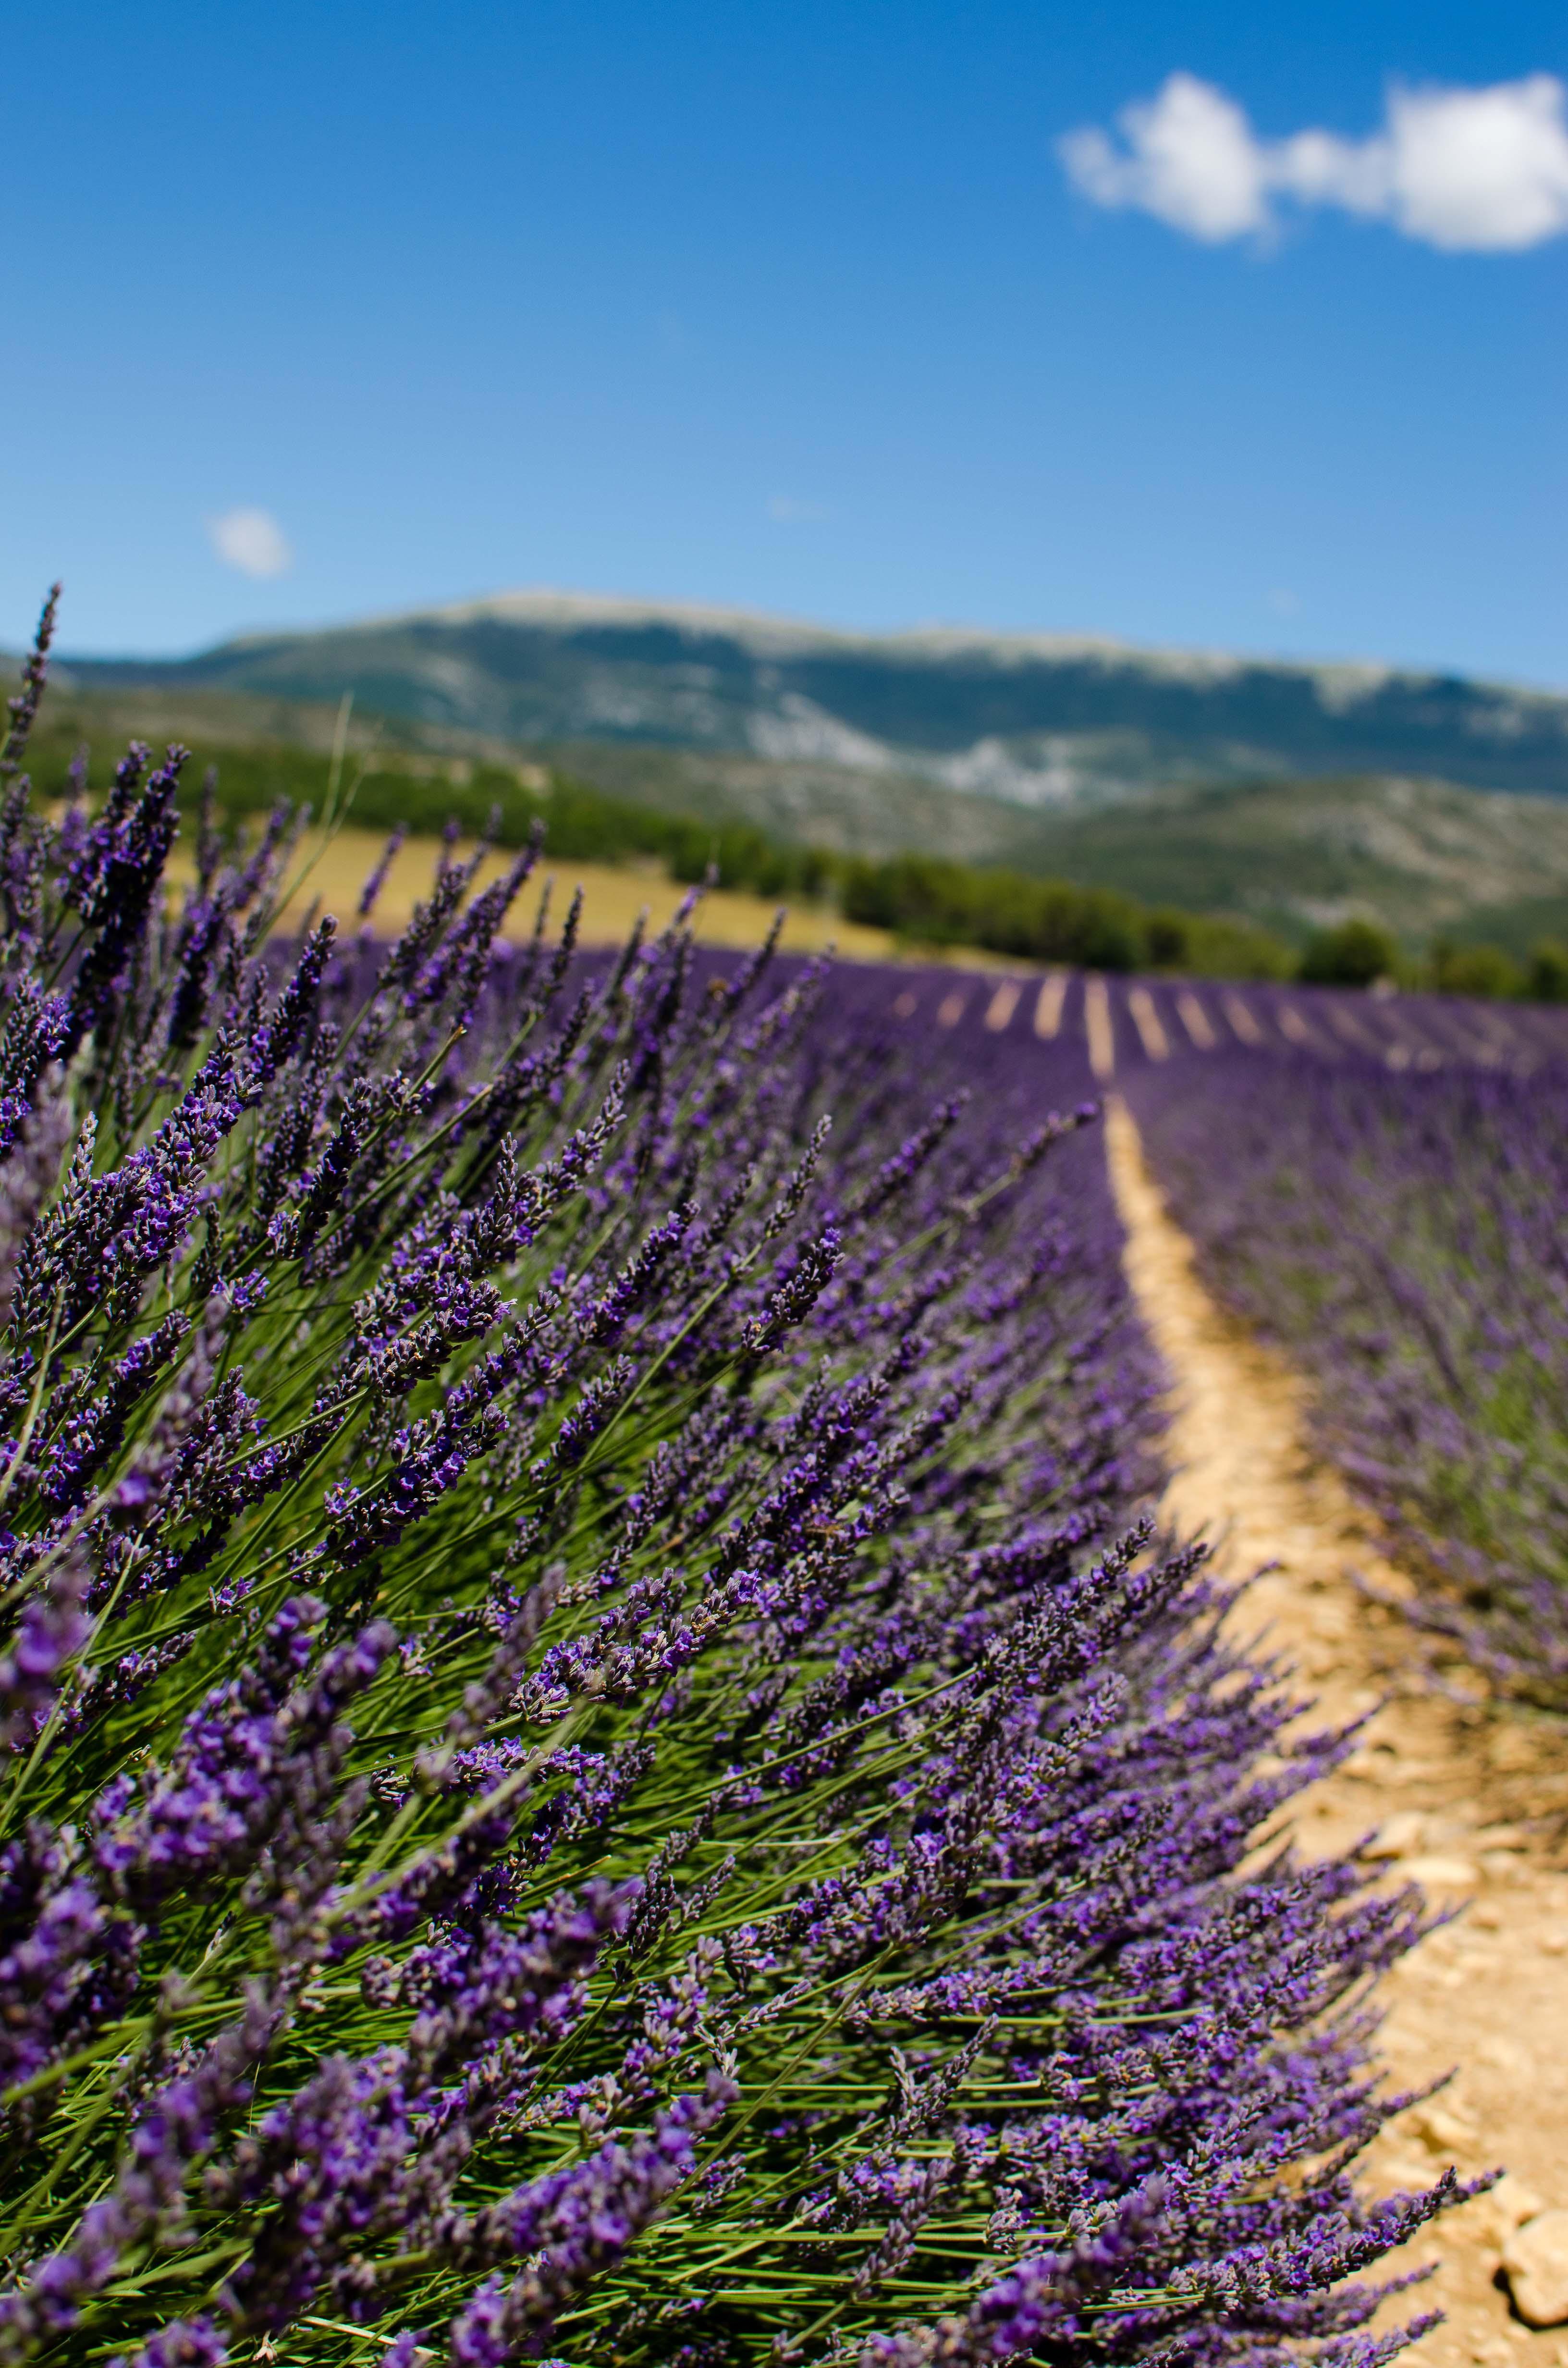 provenza3 Vacanze in Provenza, Camargue e Costa Azzurra